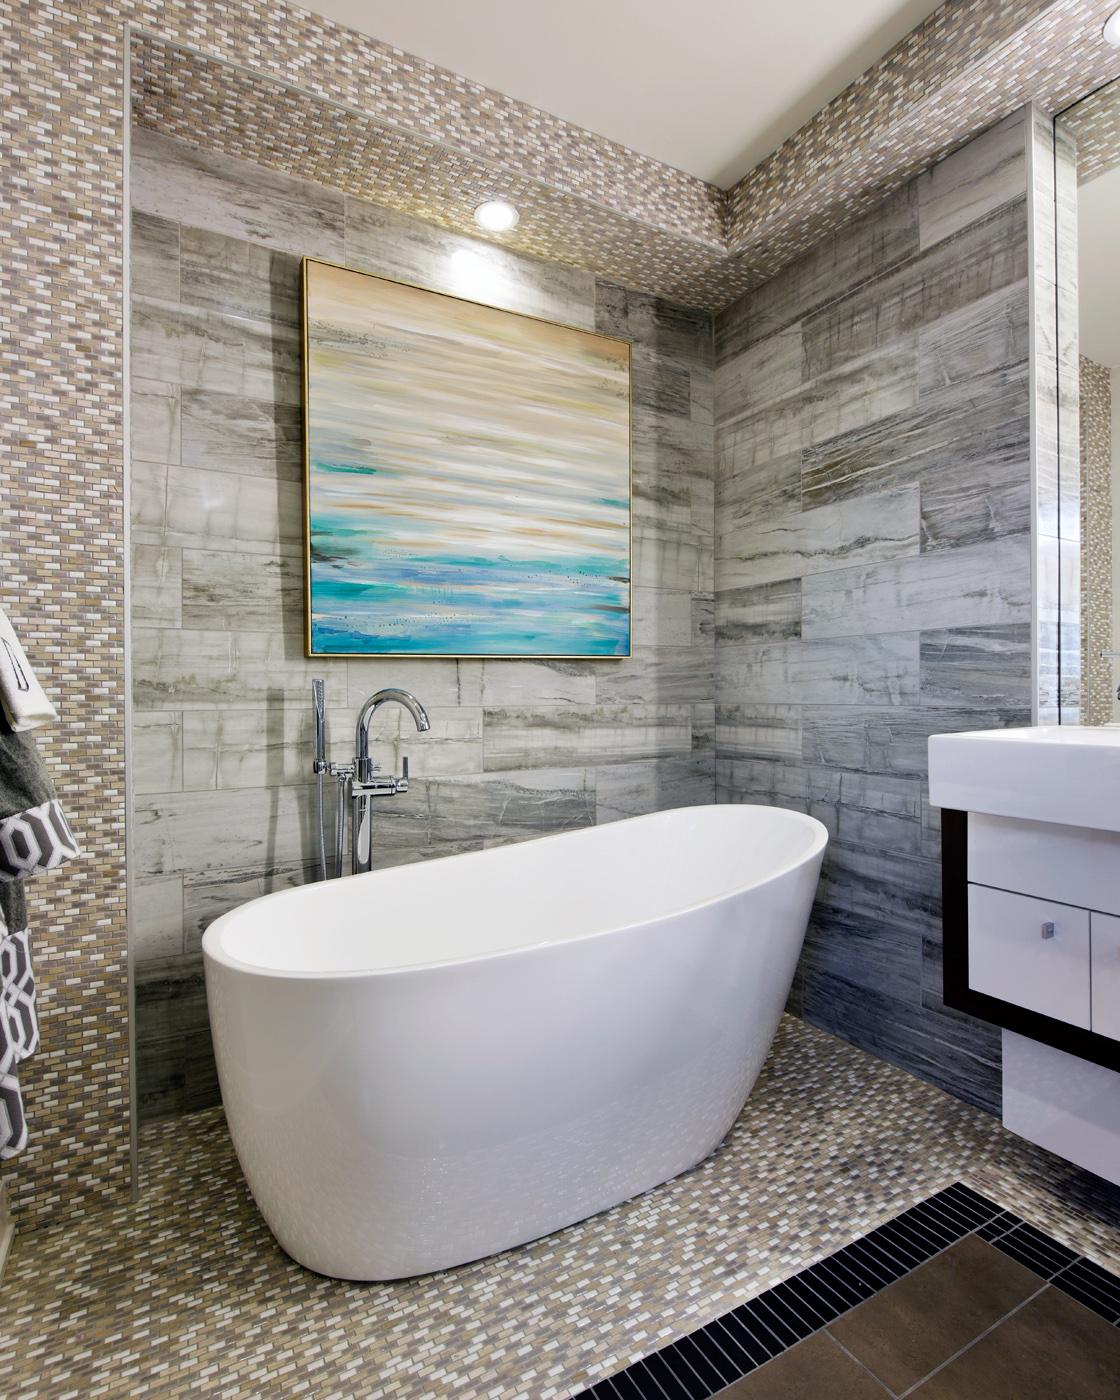 Master Bathroom - Freestanding Bath